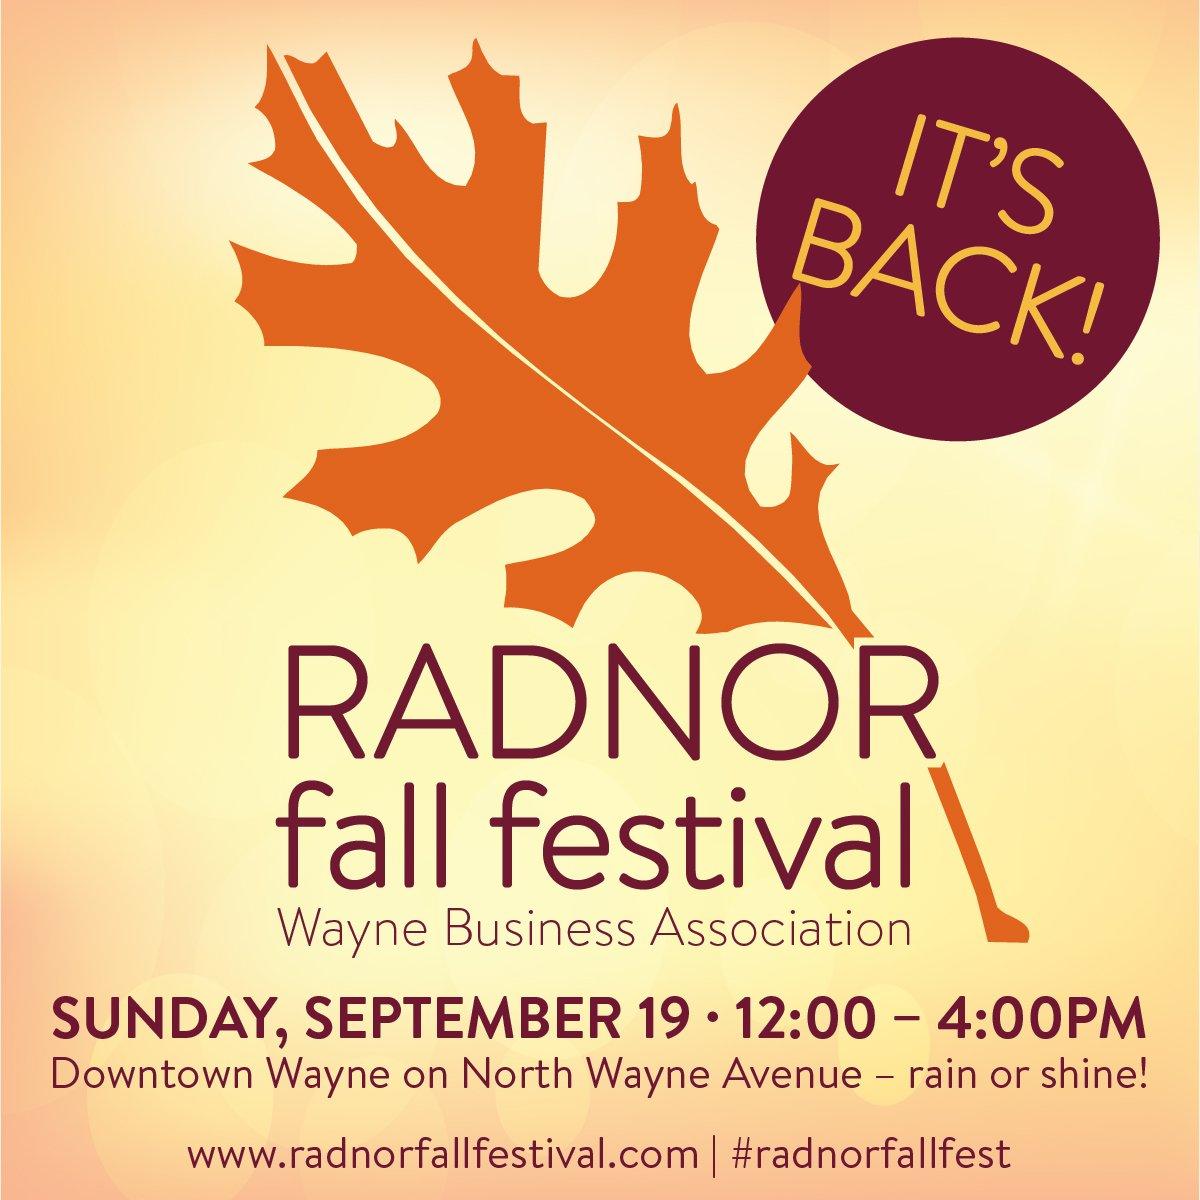 Radnor Fall Fest